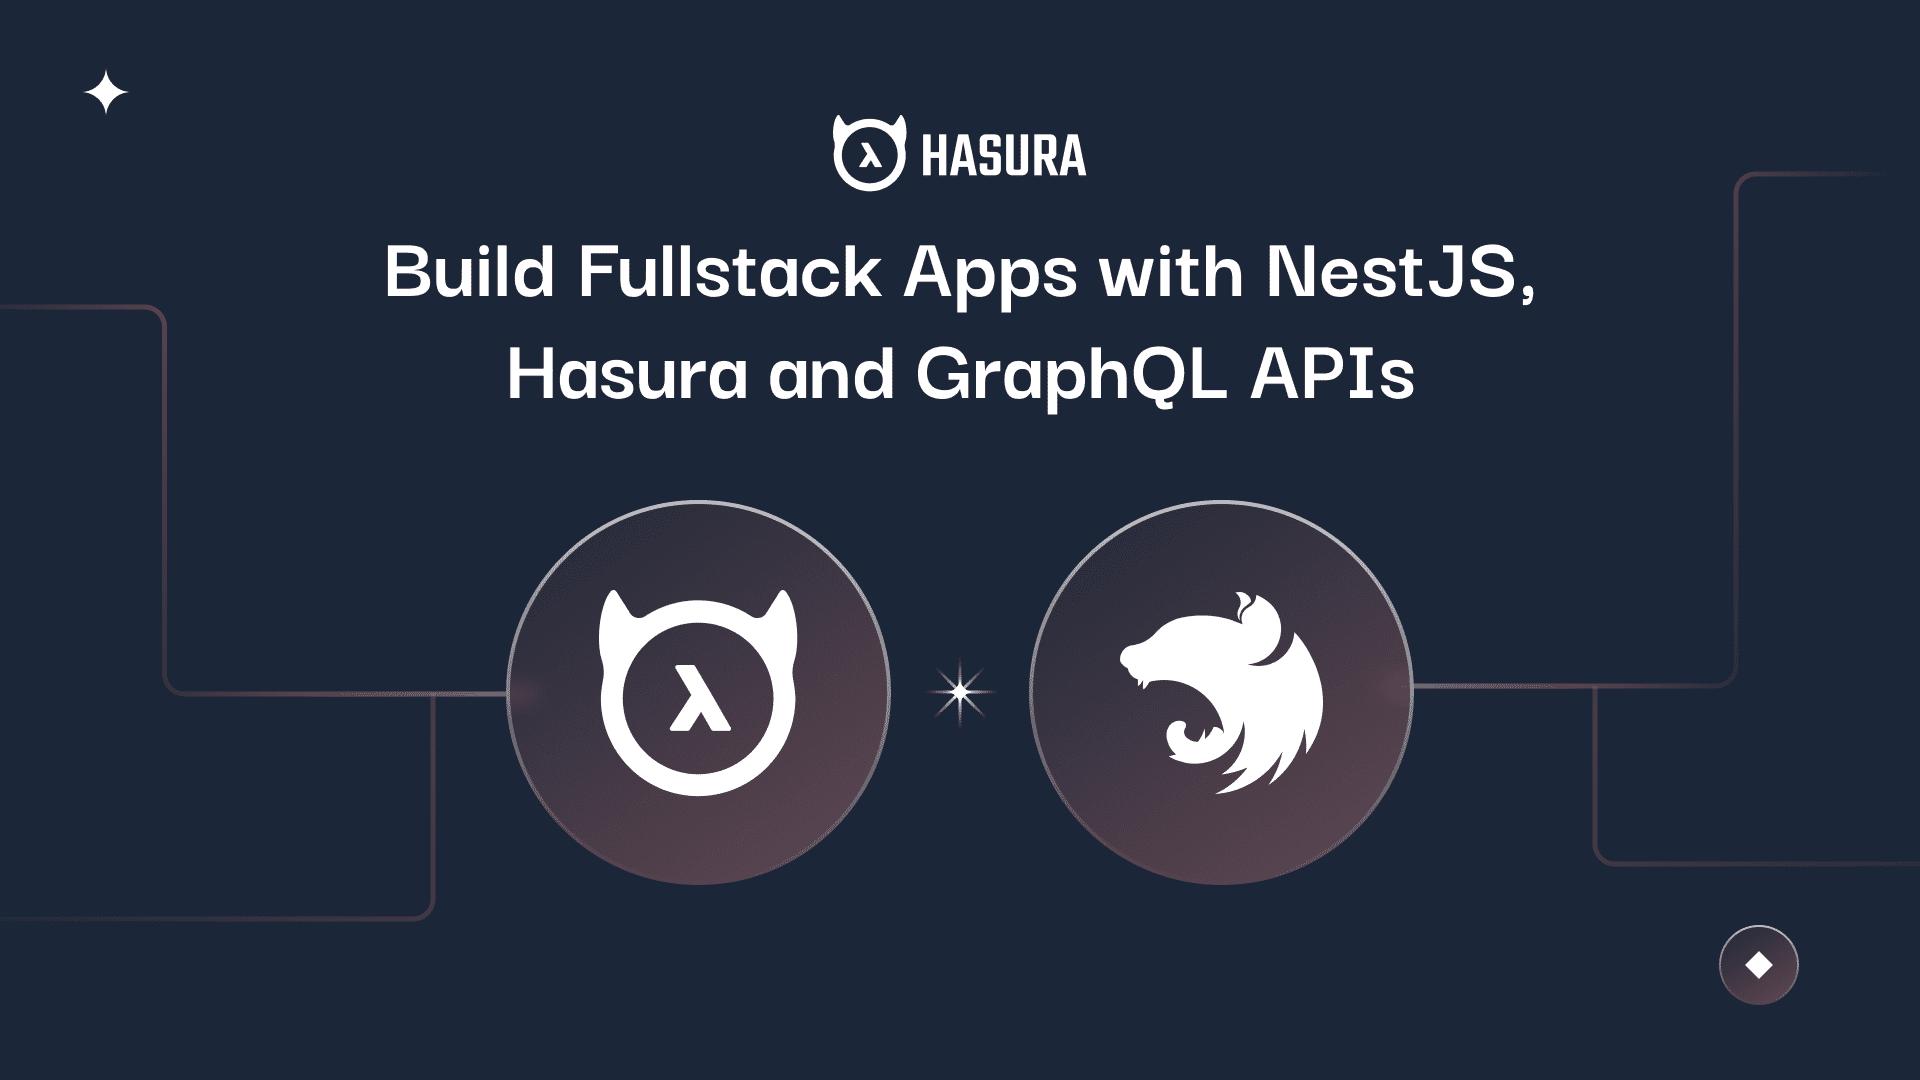 Build Fullstack Apps with NestJS, Hasura, and GraphQL APIs